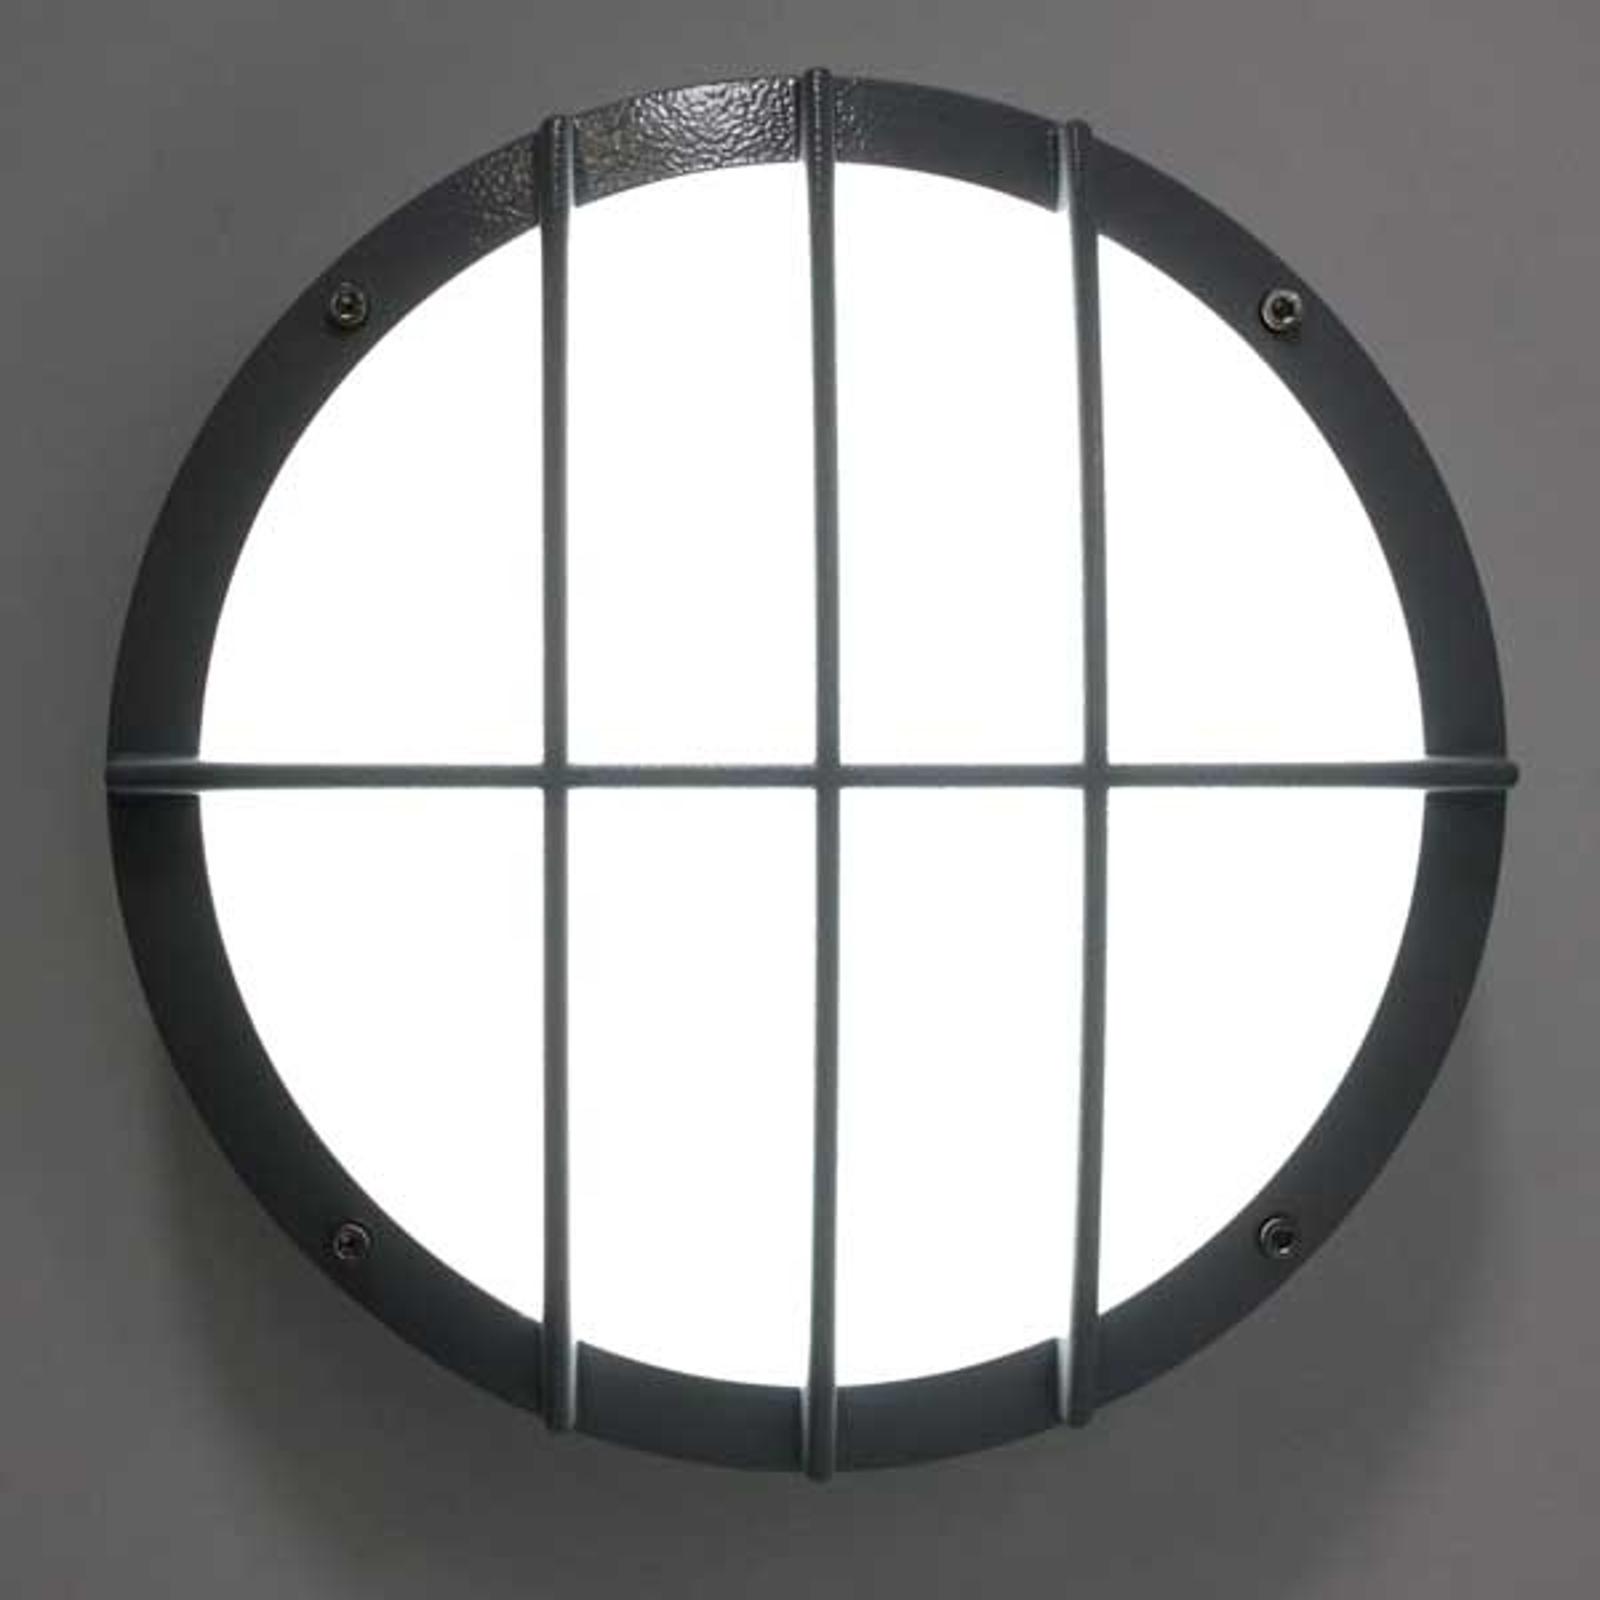 SUN 8 LED die-cast aluminium wall light_1018204_1